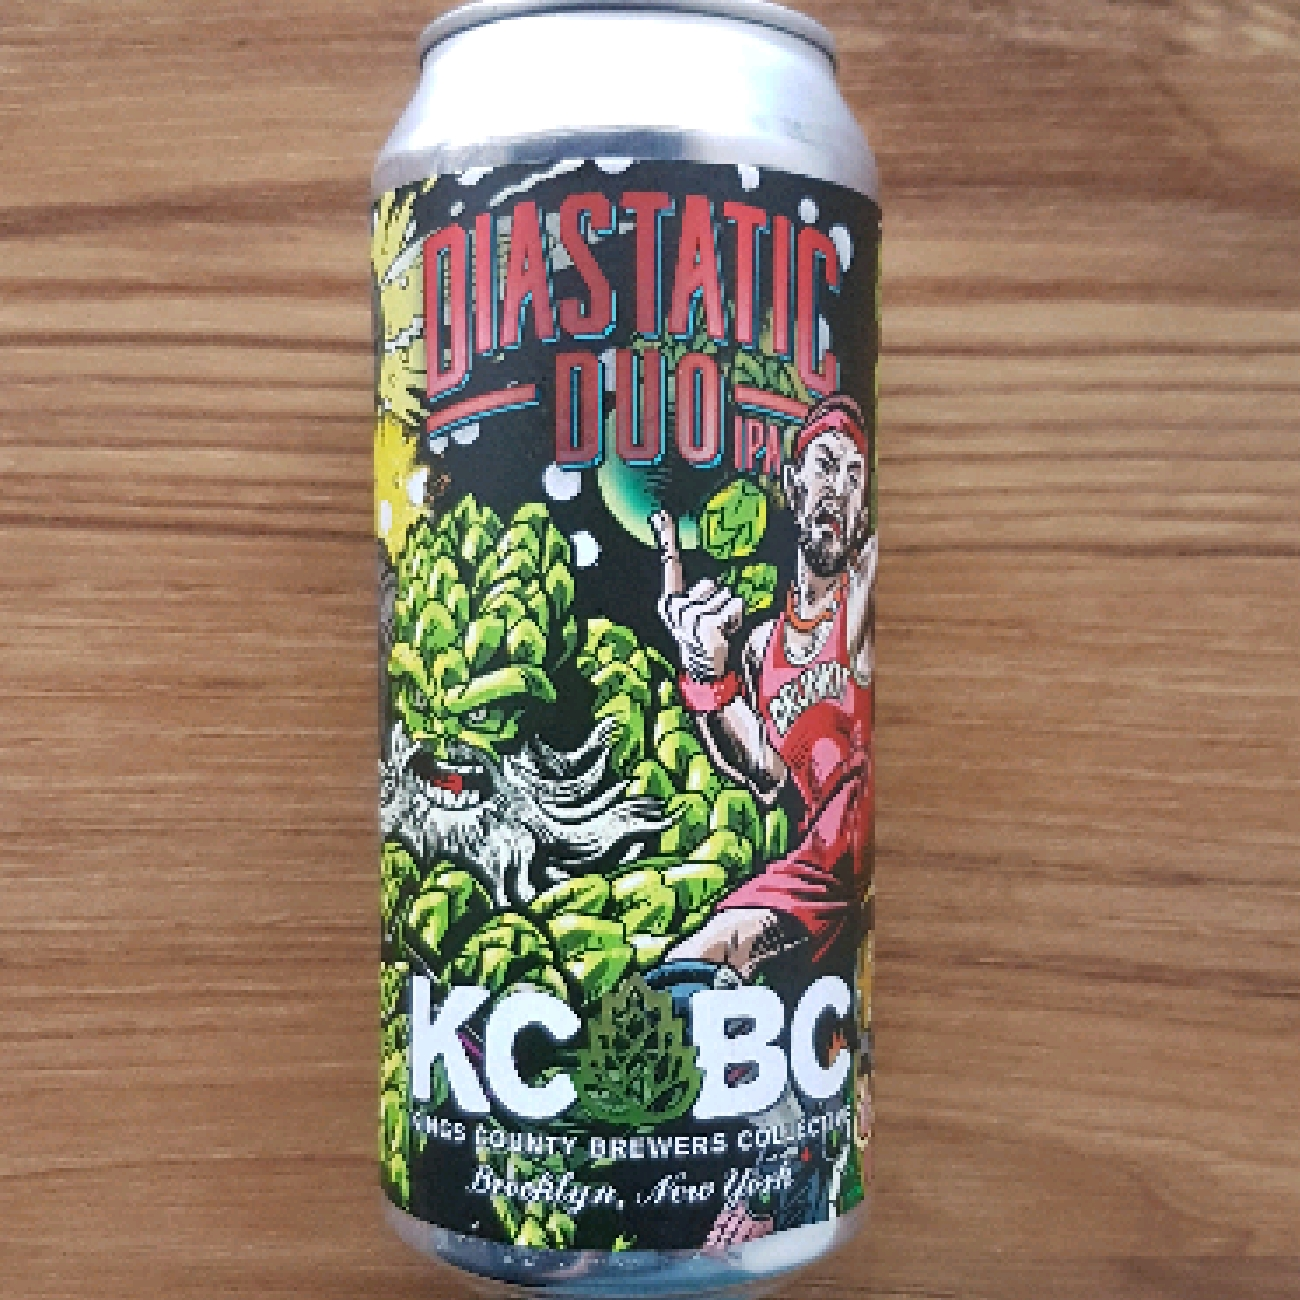 KCBC Diastatic Duo